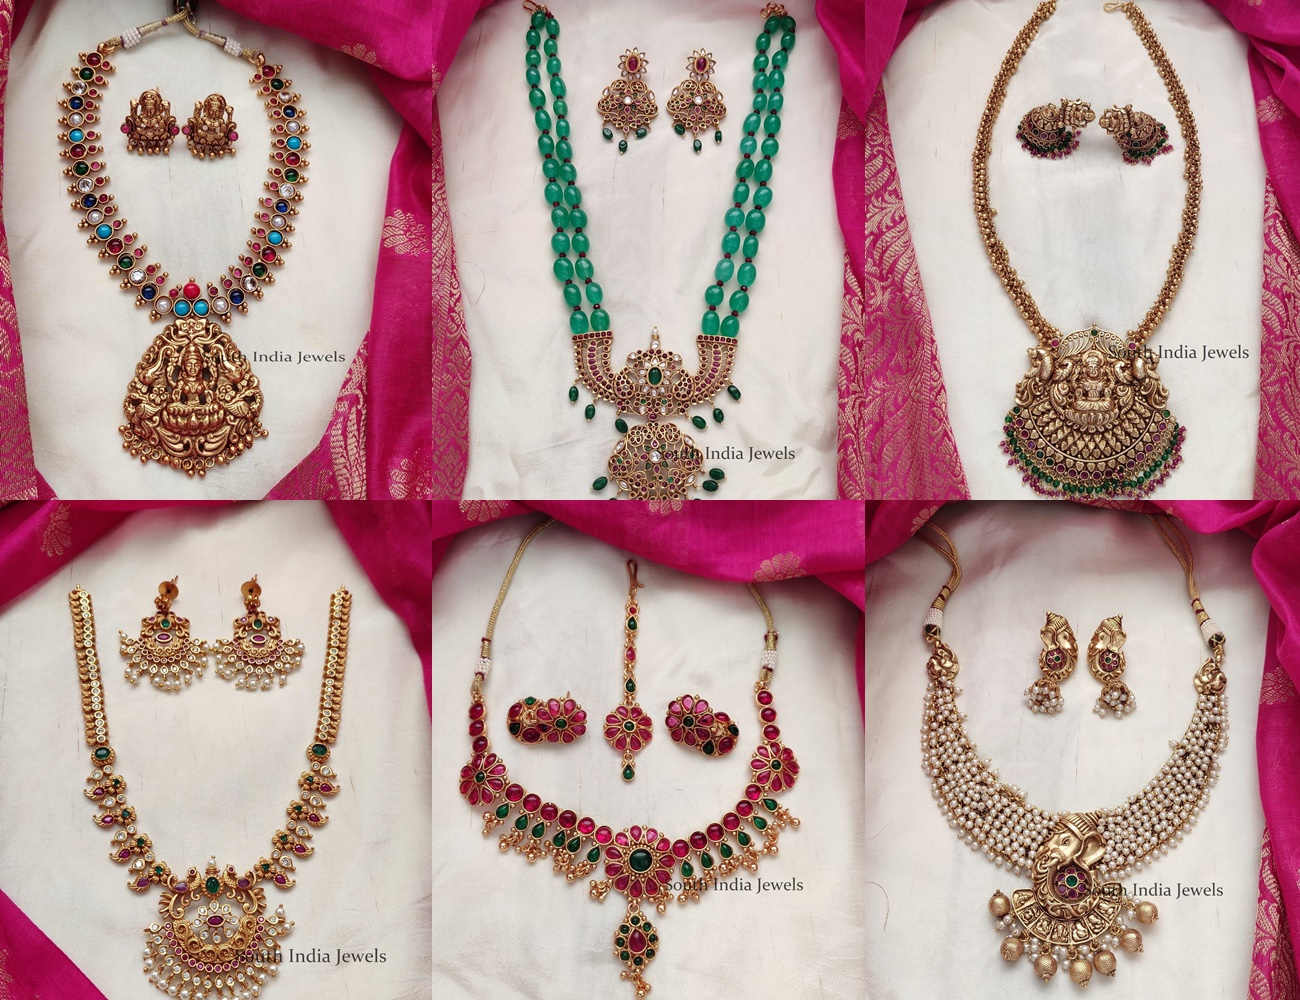 imitation-necklace-sets